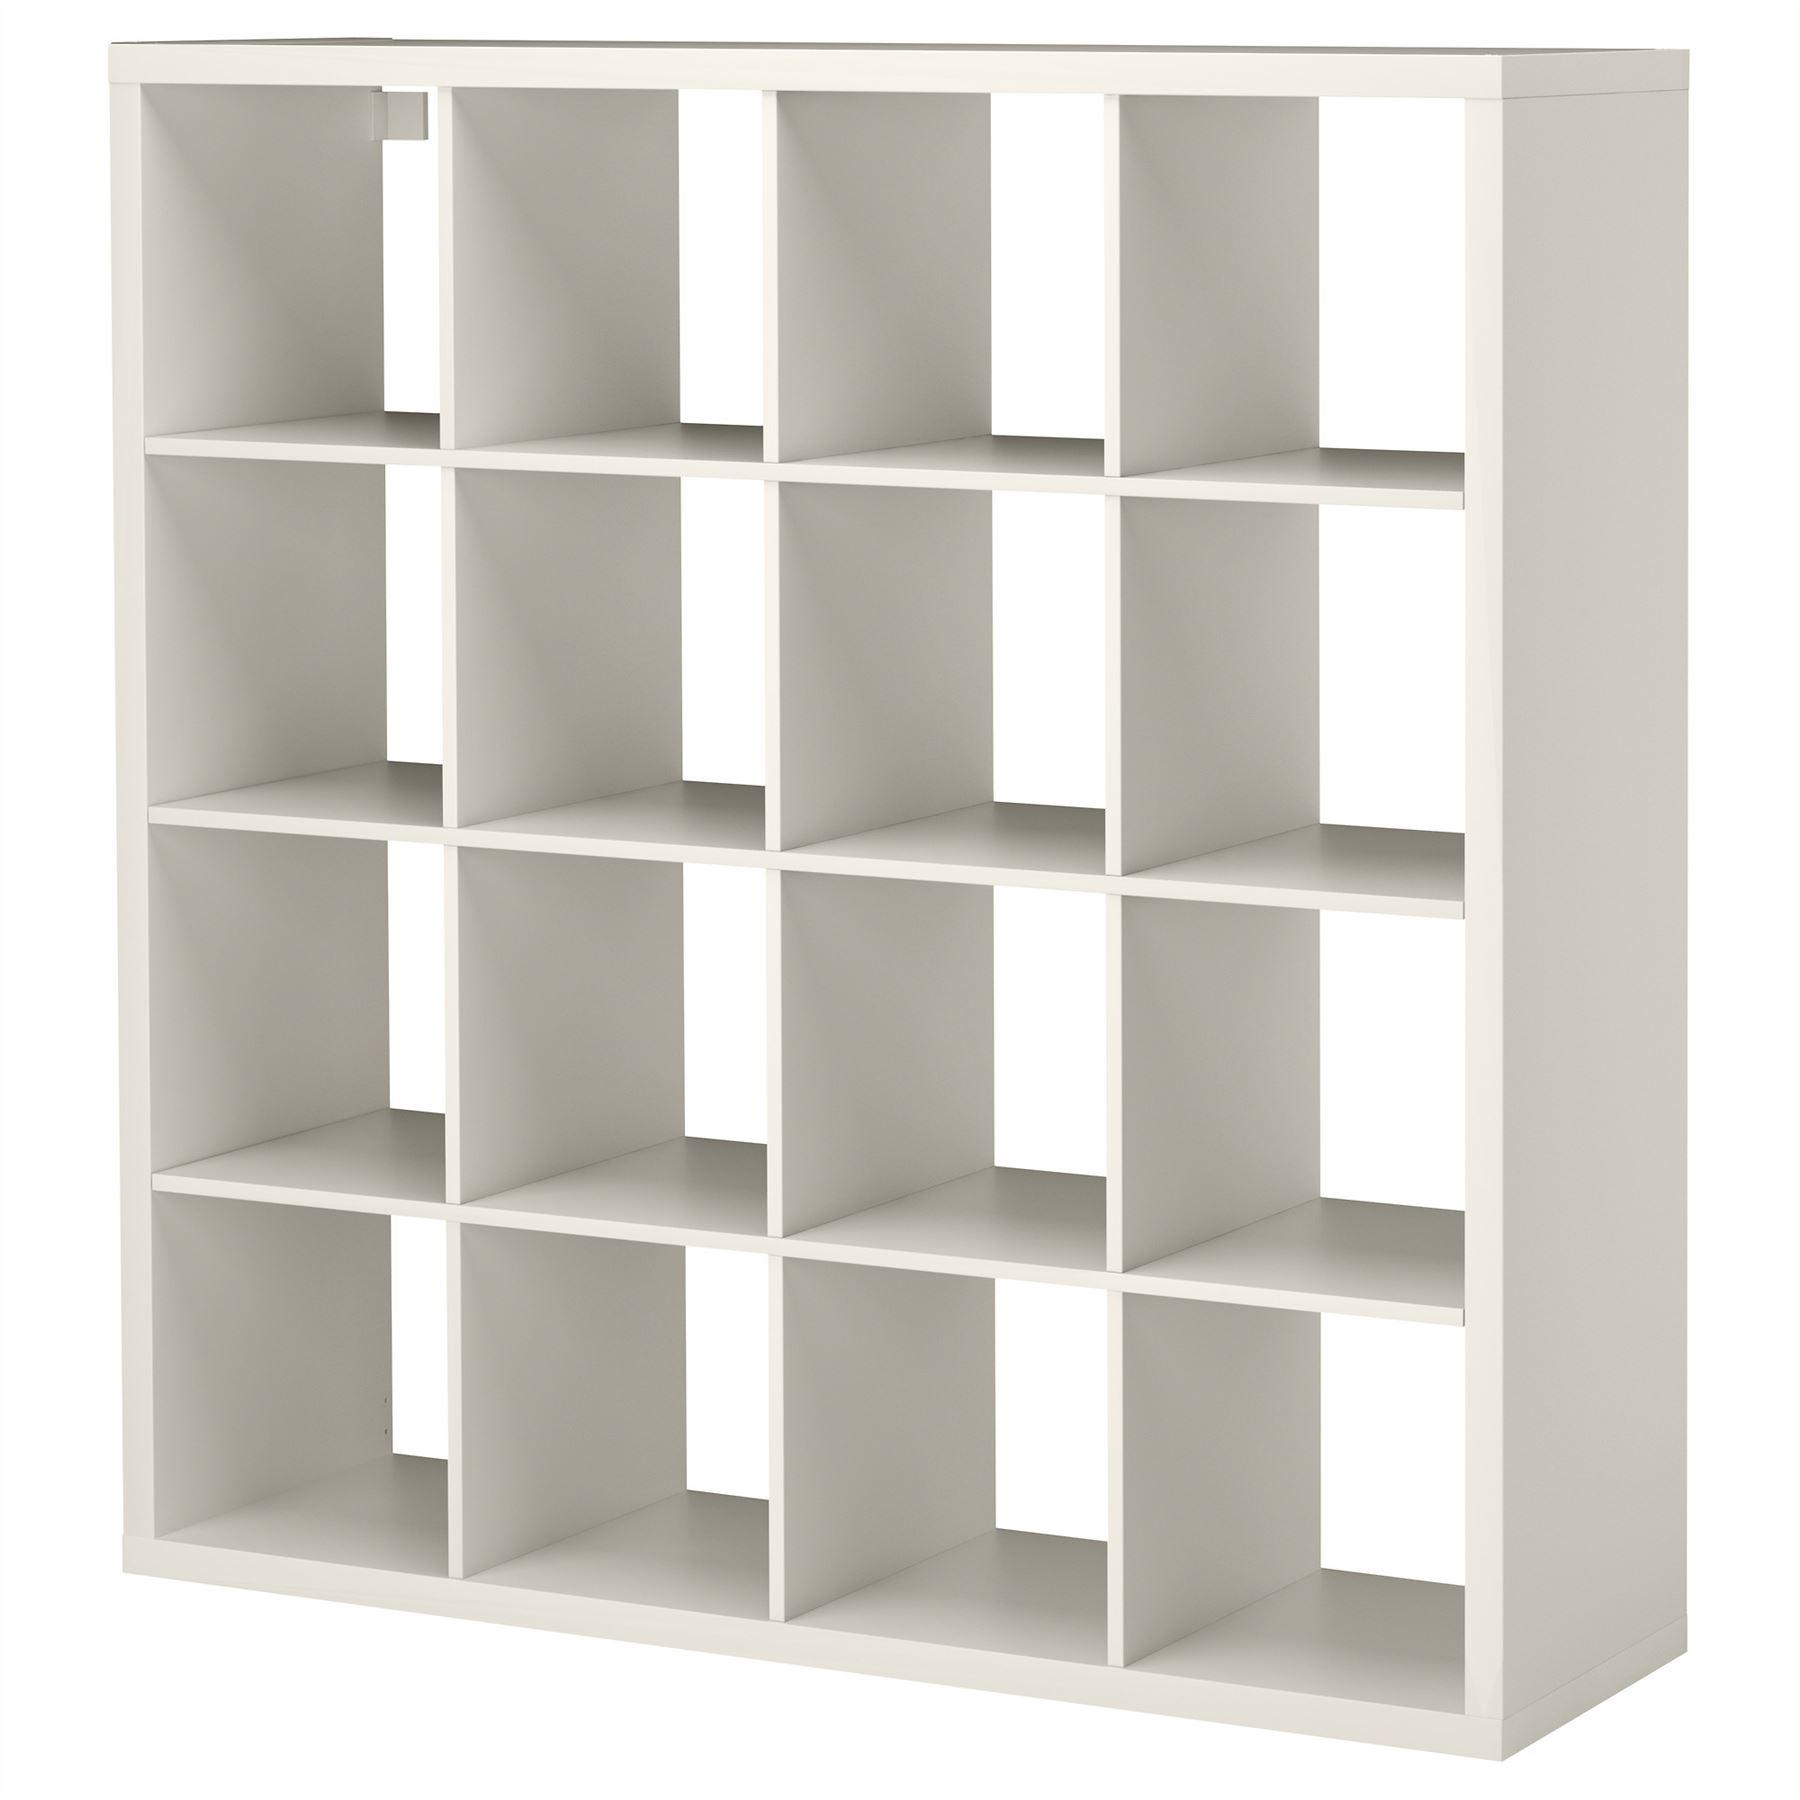 Ikea kallax 16 cube storage bookcase square shelving unit for Ikea storage bin unit